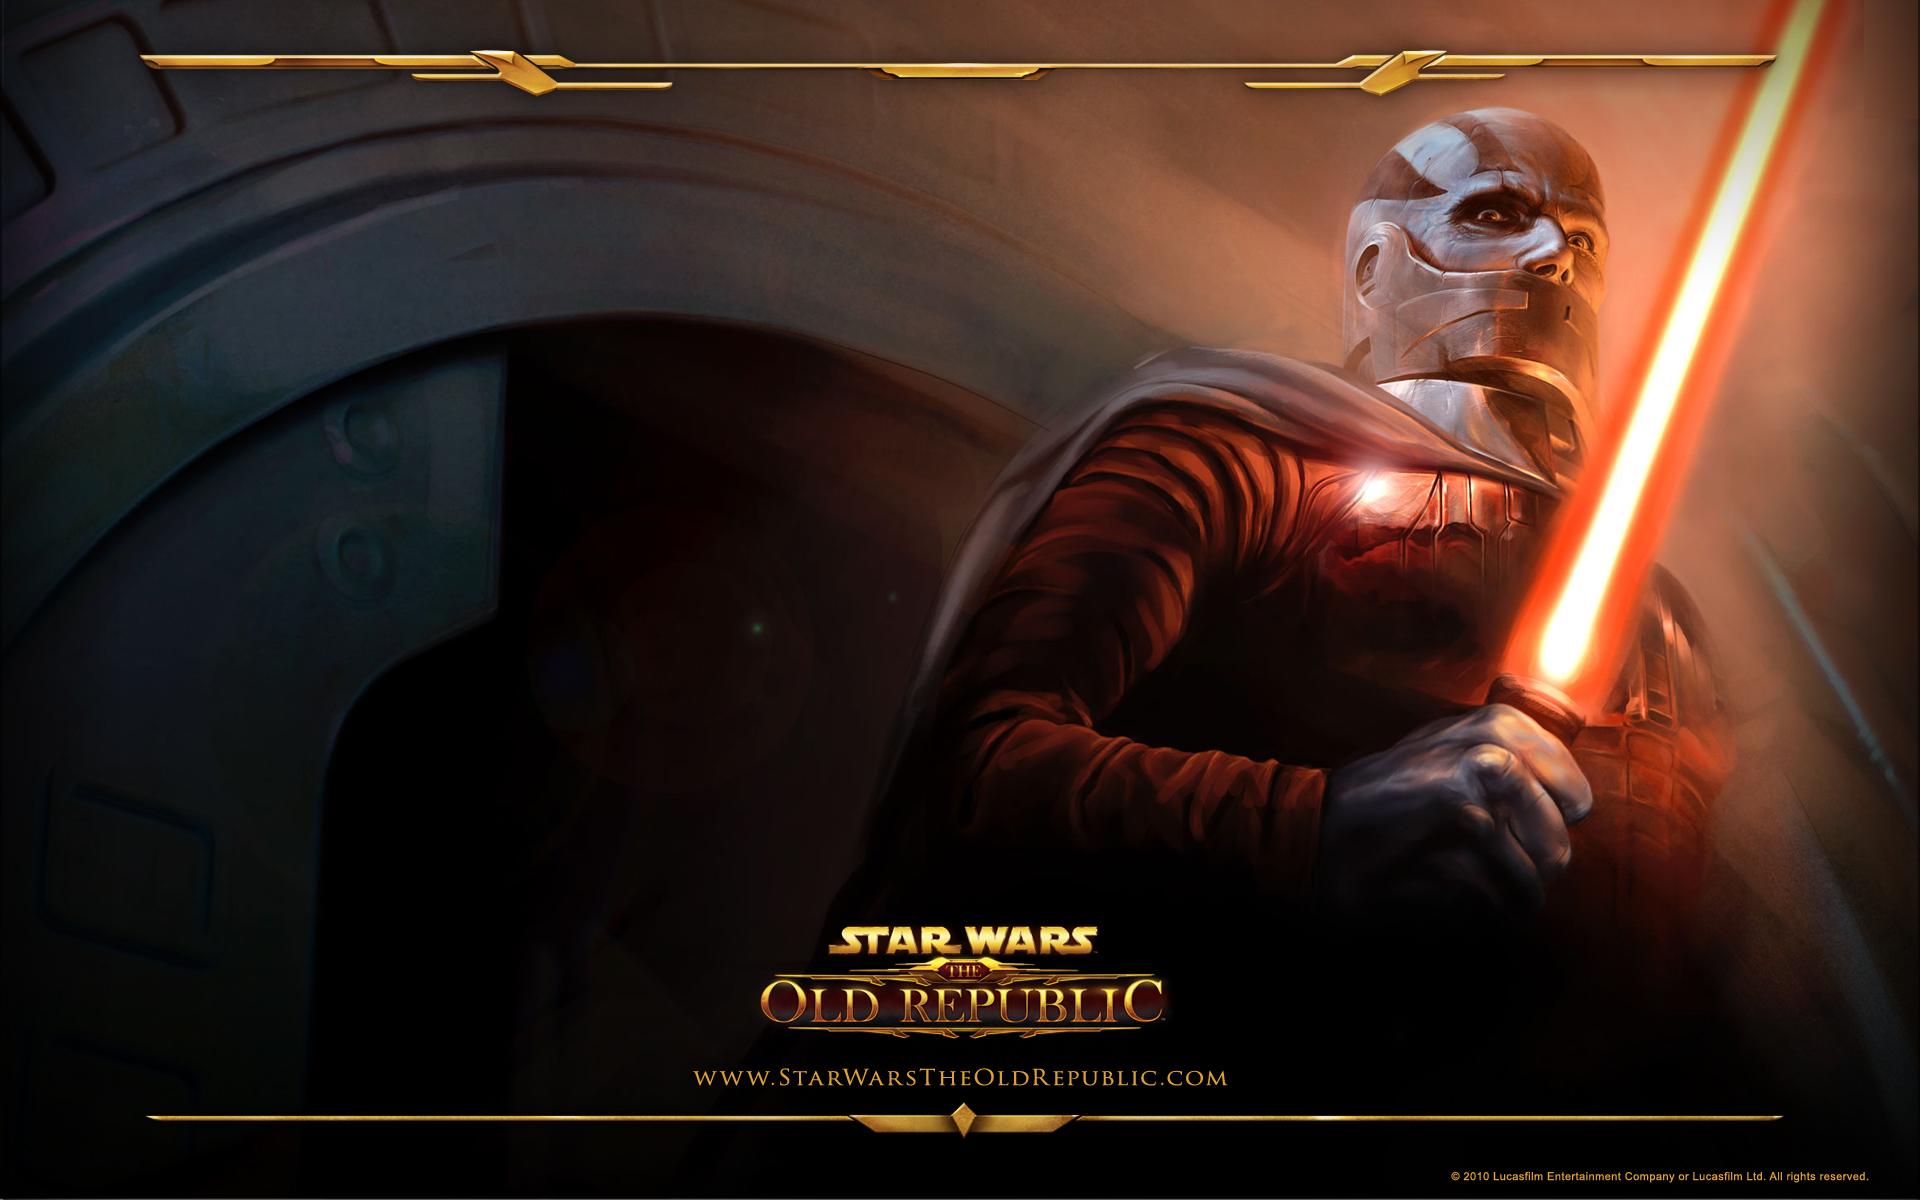 Star Wars: The Old Republic Wallpaper Darth Malak